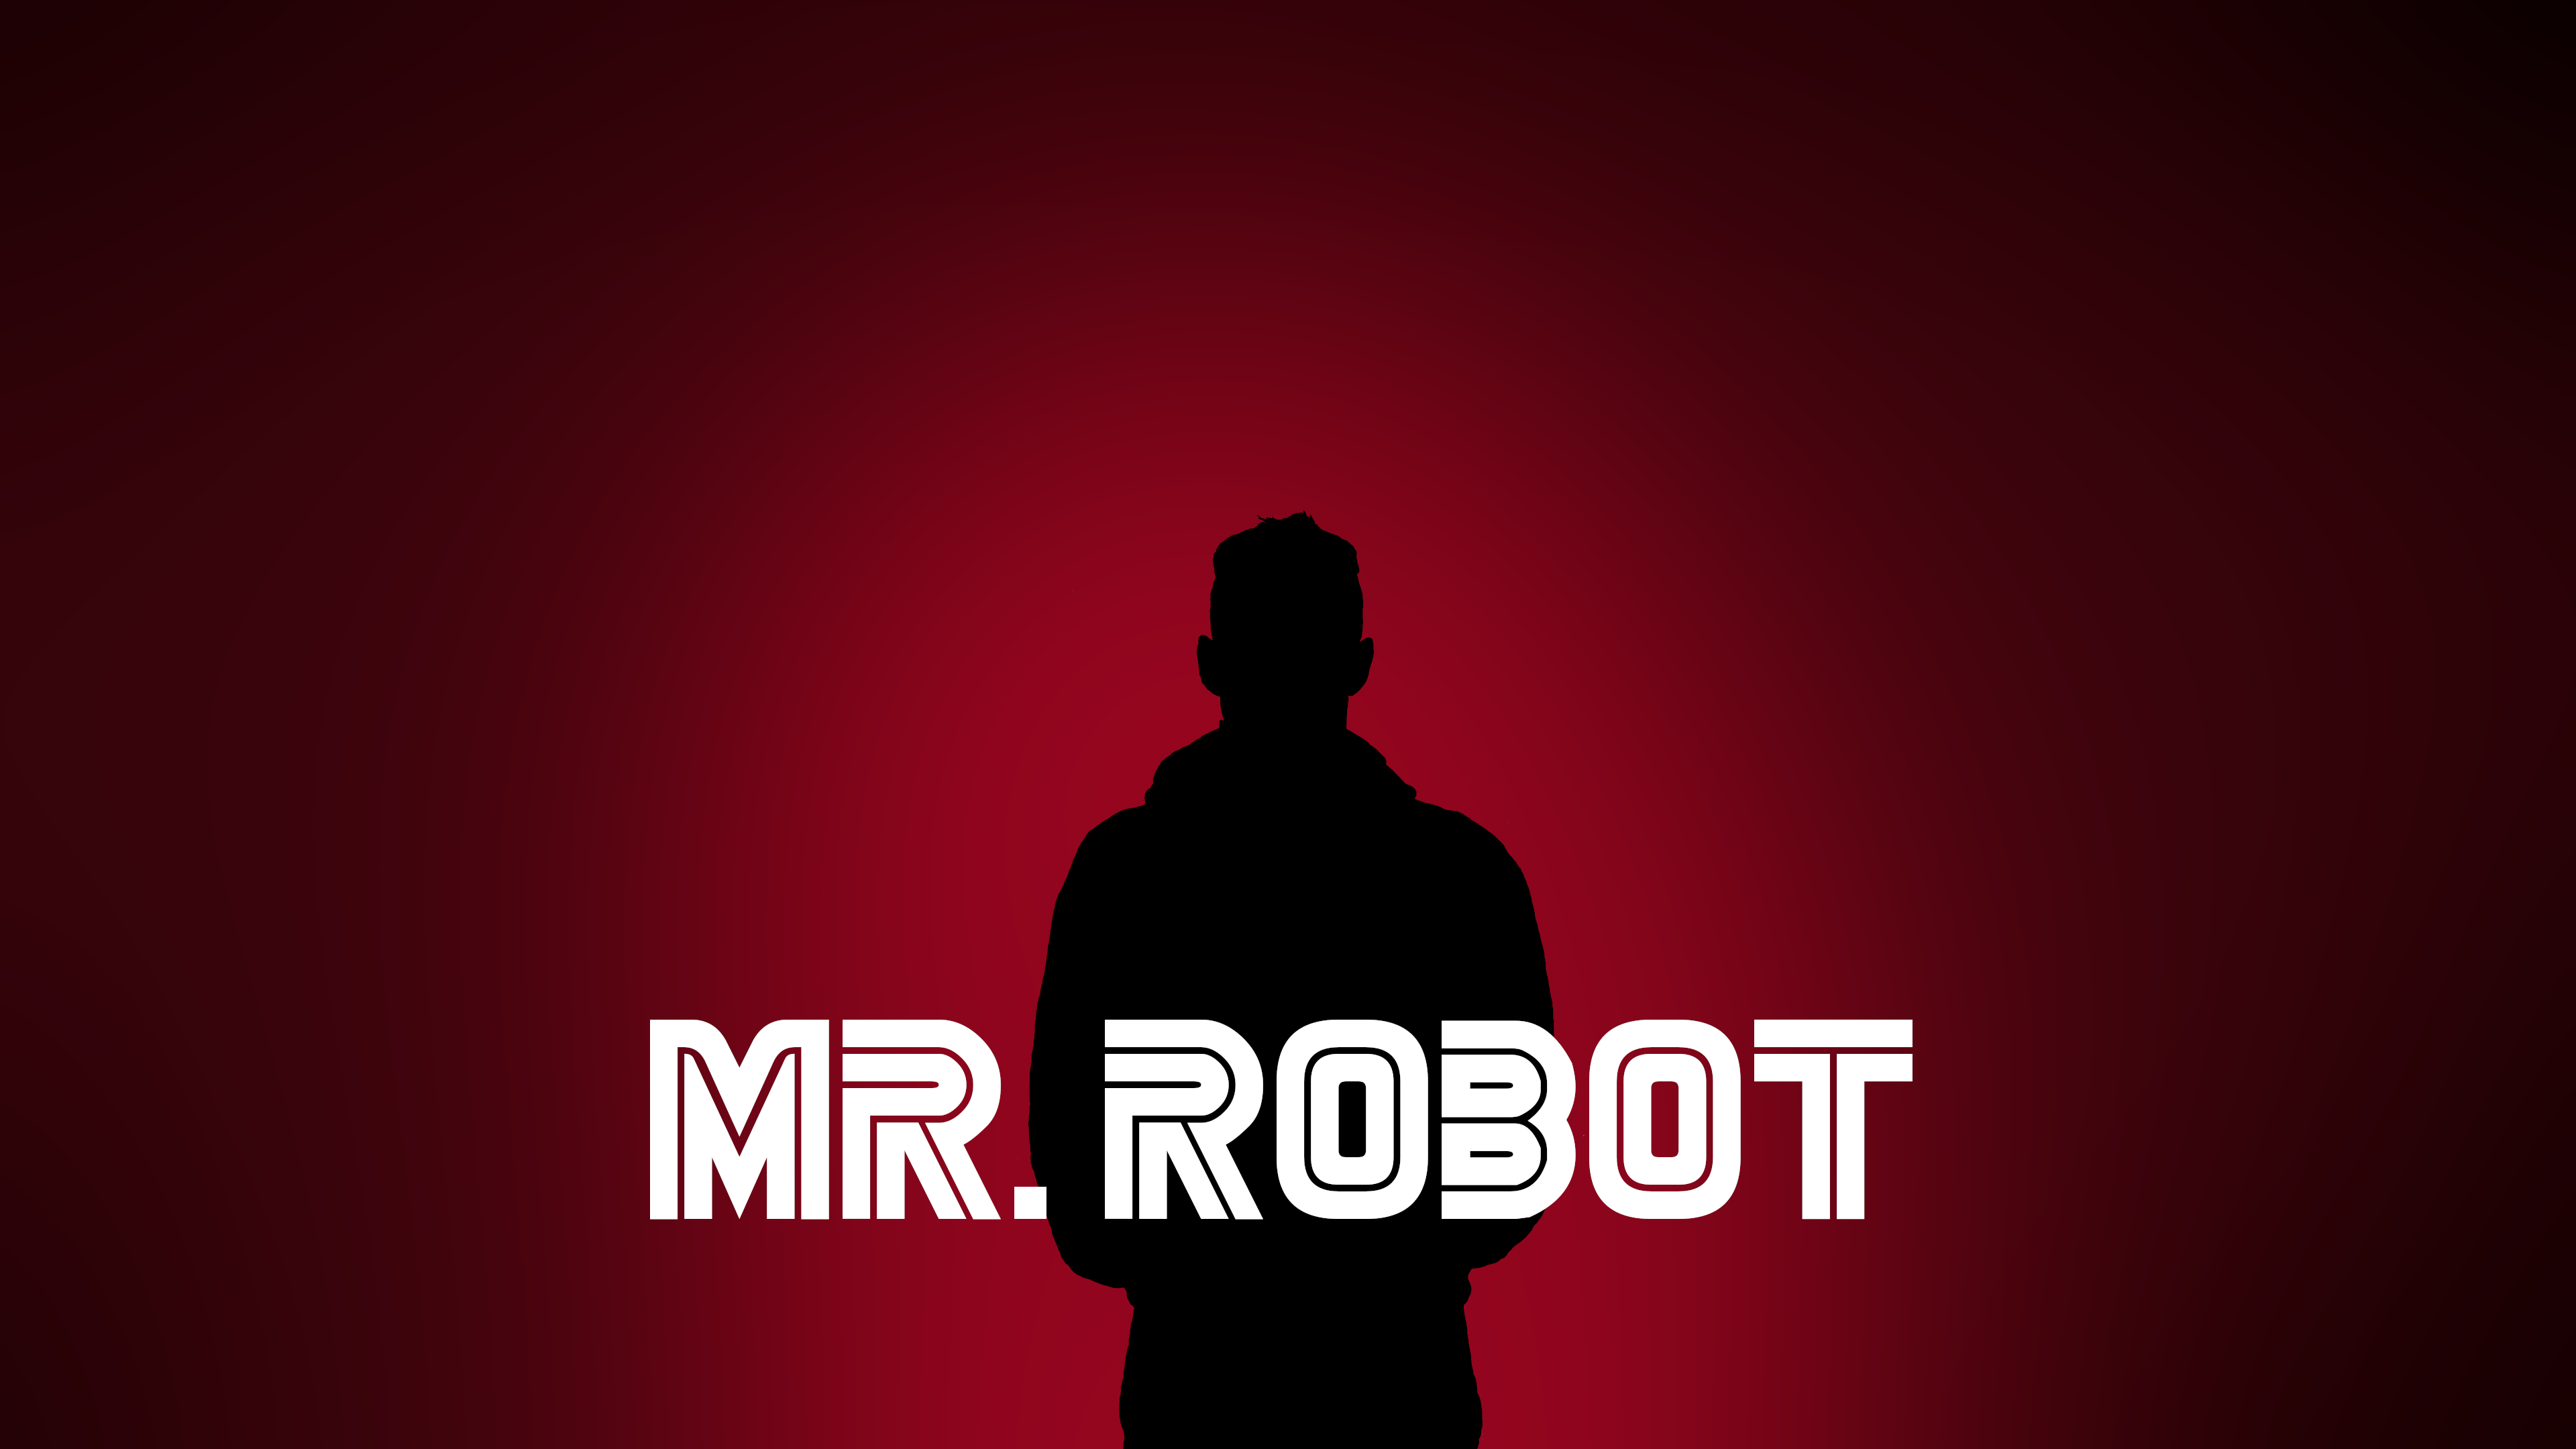 Desktop Mr Robot Wallpapers Wallpaper Cave